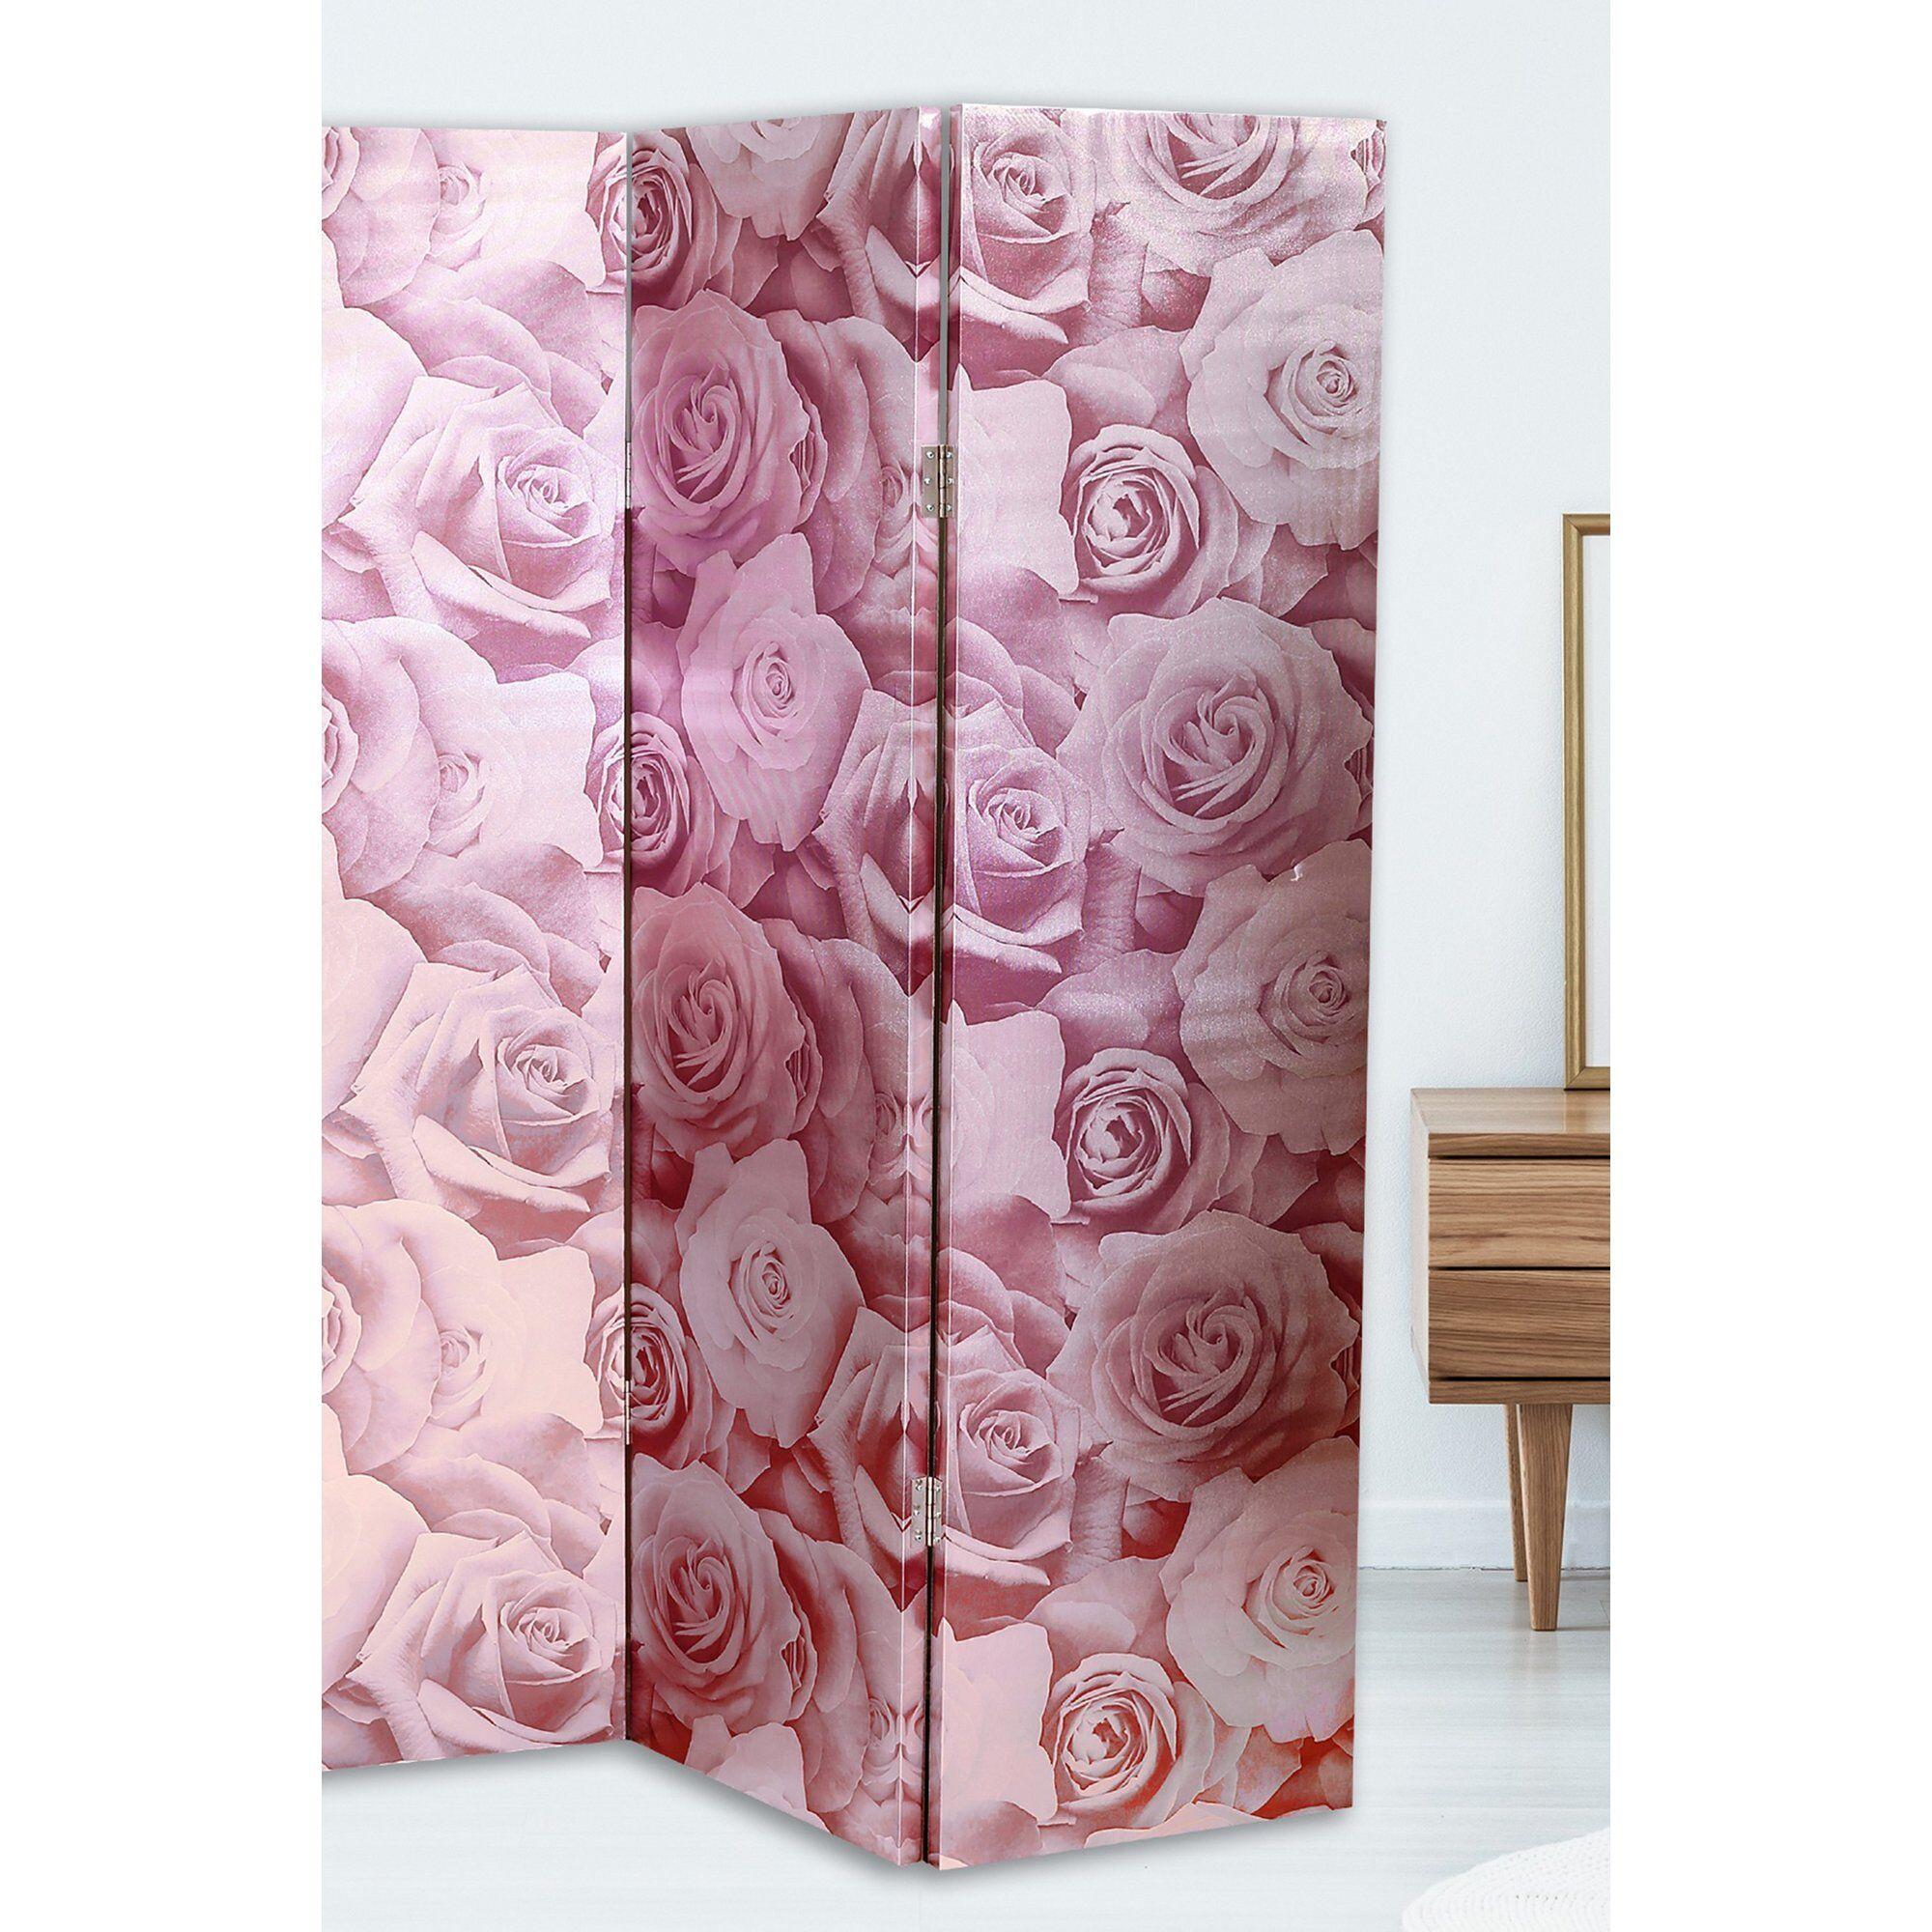 Studio Romance Room Divider Screen  - Pink